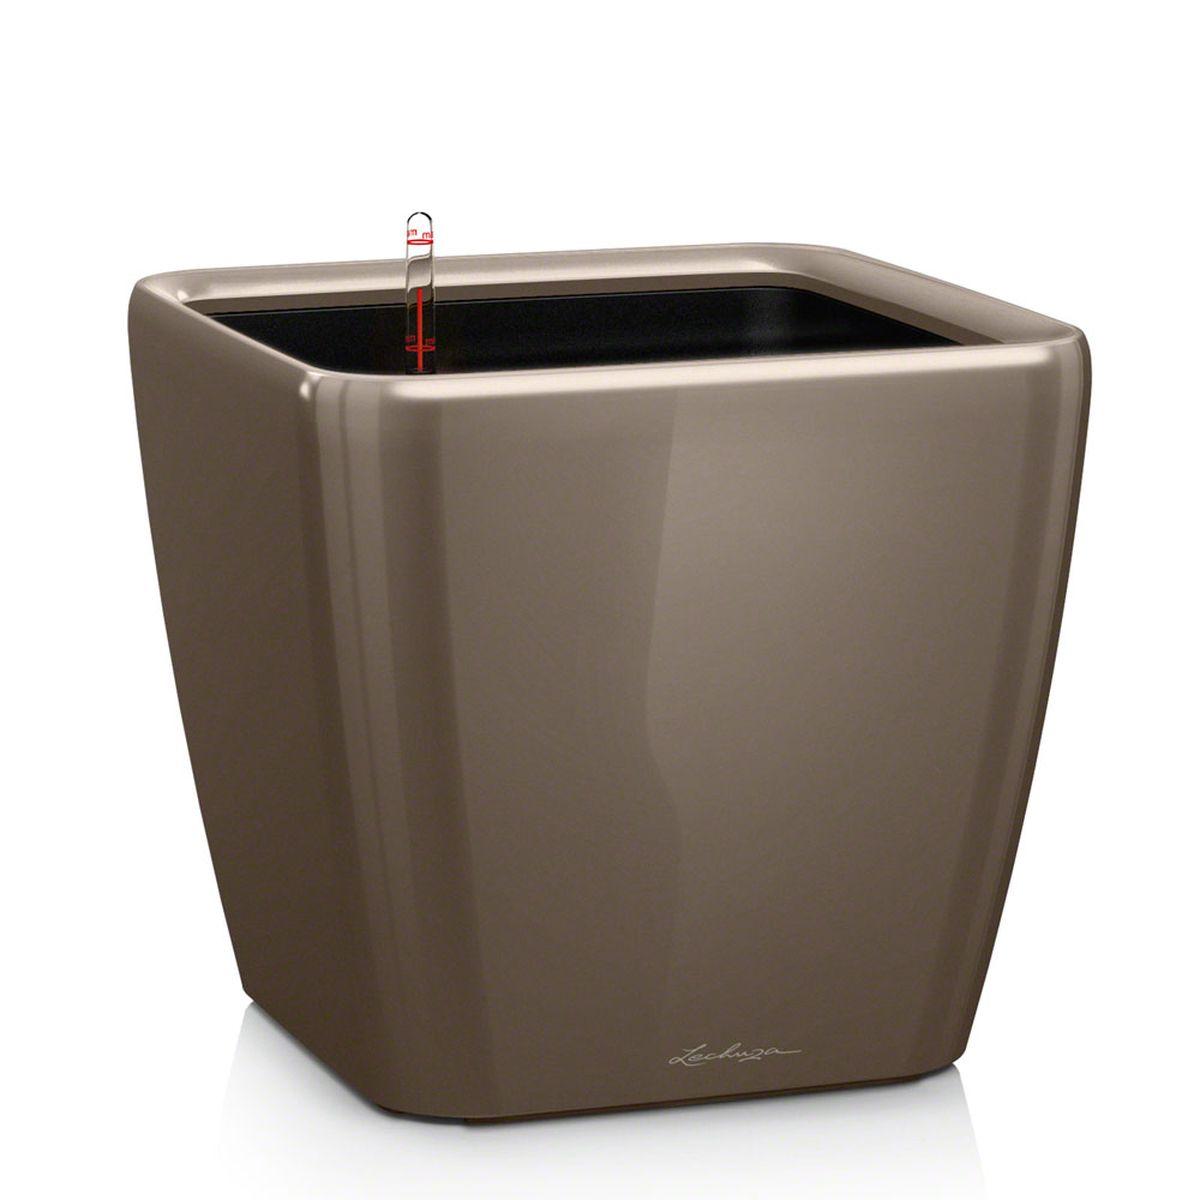 "Кашпо Lechuza ""Quadro"", с системой автополива, цвет: серо-коричневый, 43 х 43 х 40 см"